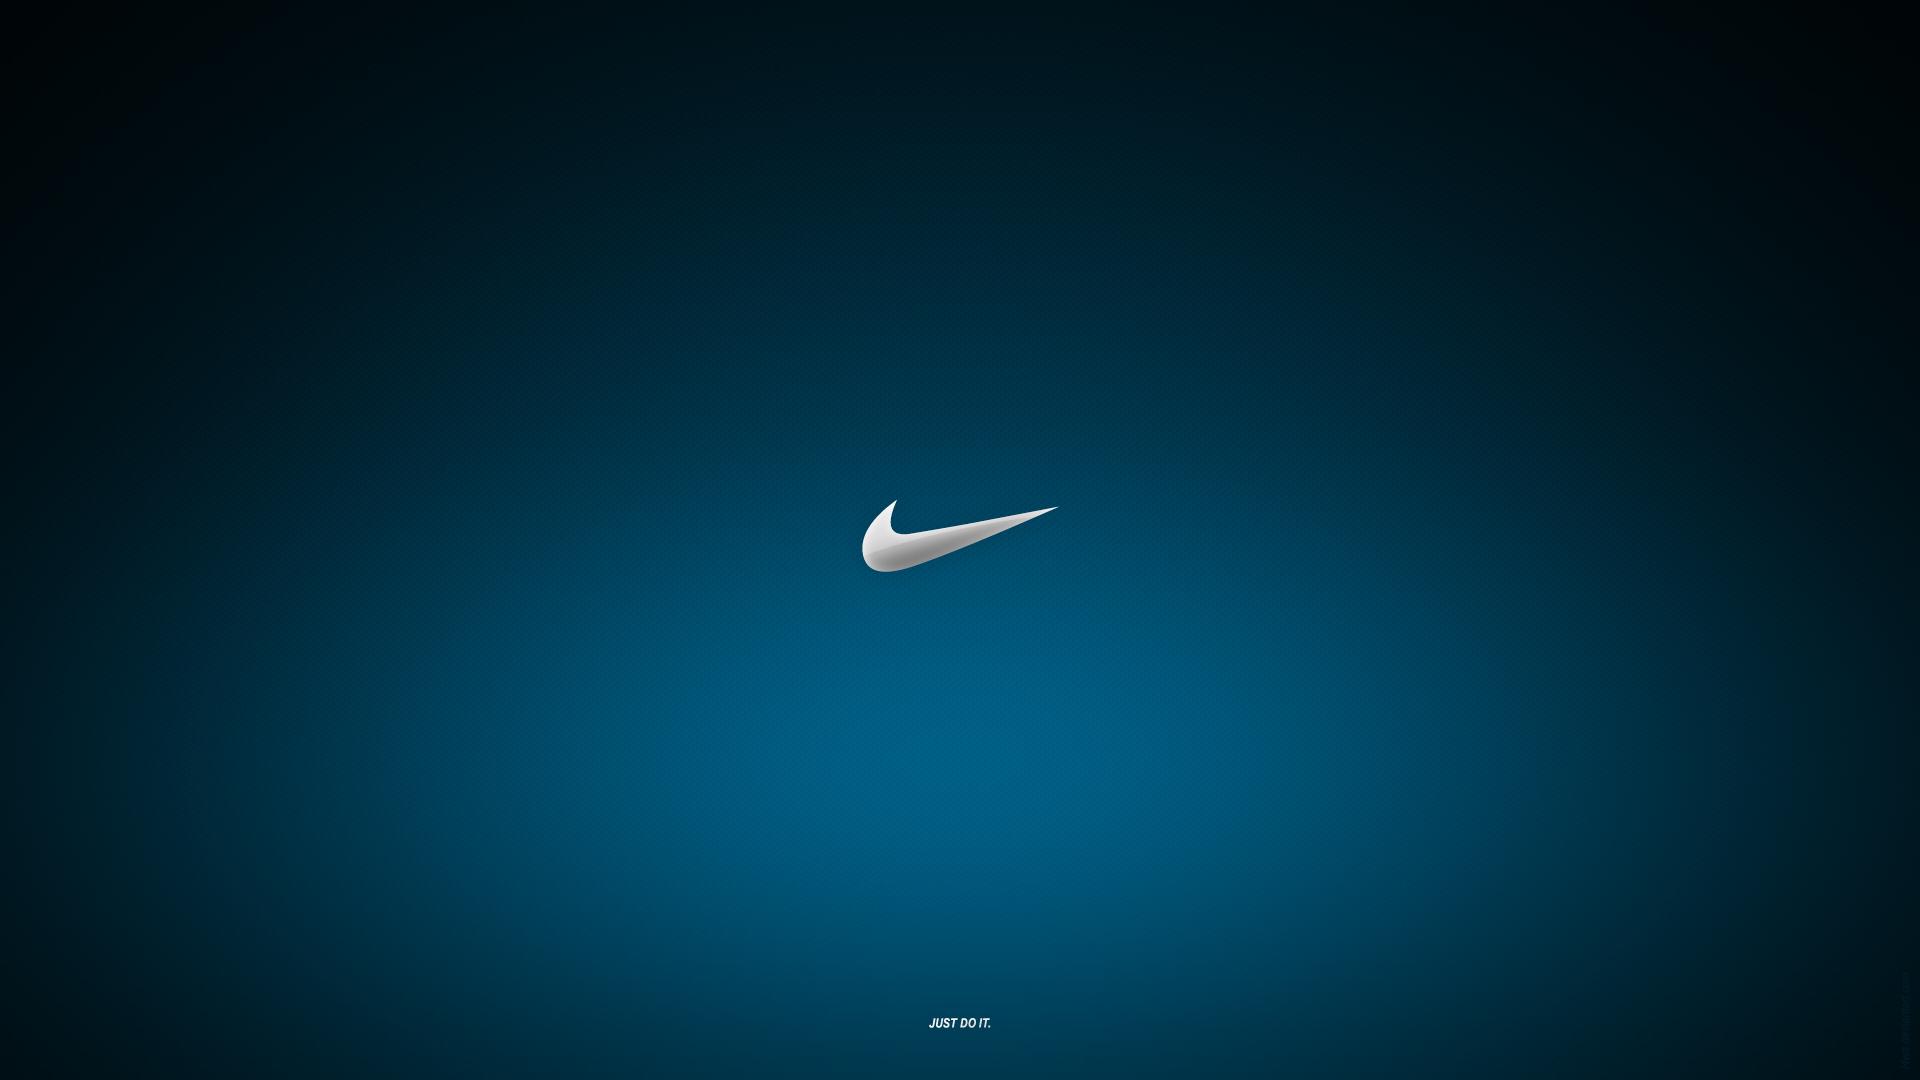 Nike Wallpapers Full HD 1920x1080